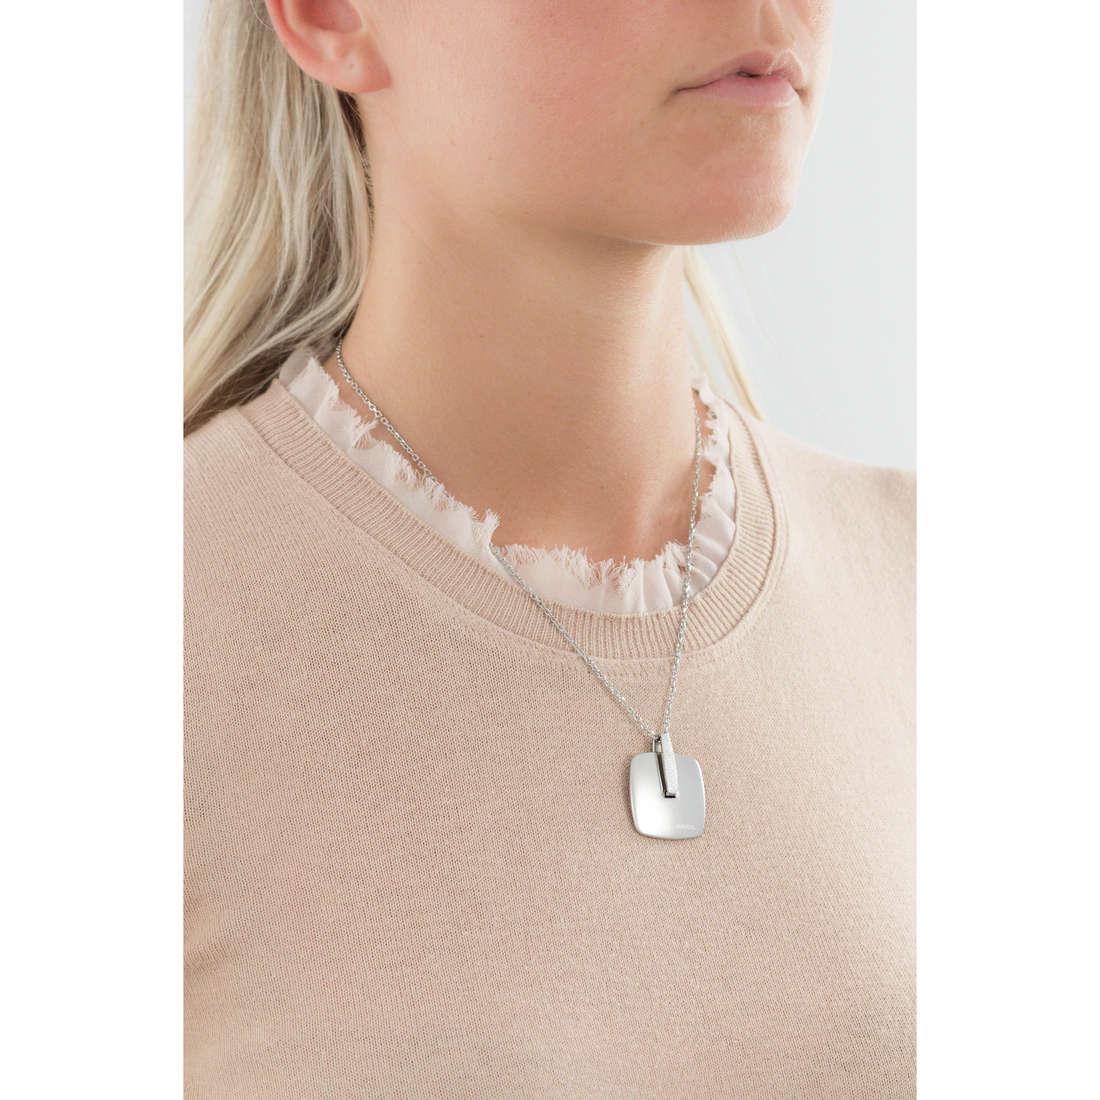 Breil colliers New Blast femme TJ1605 indosso